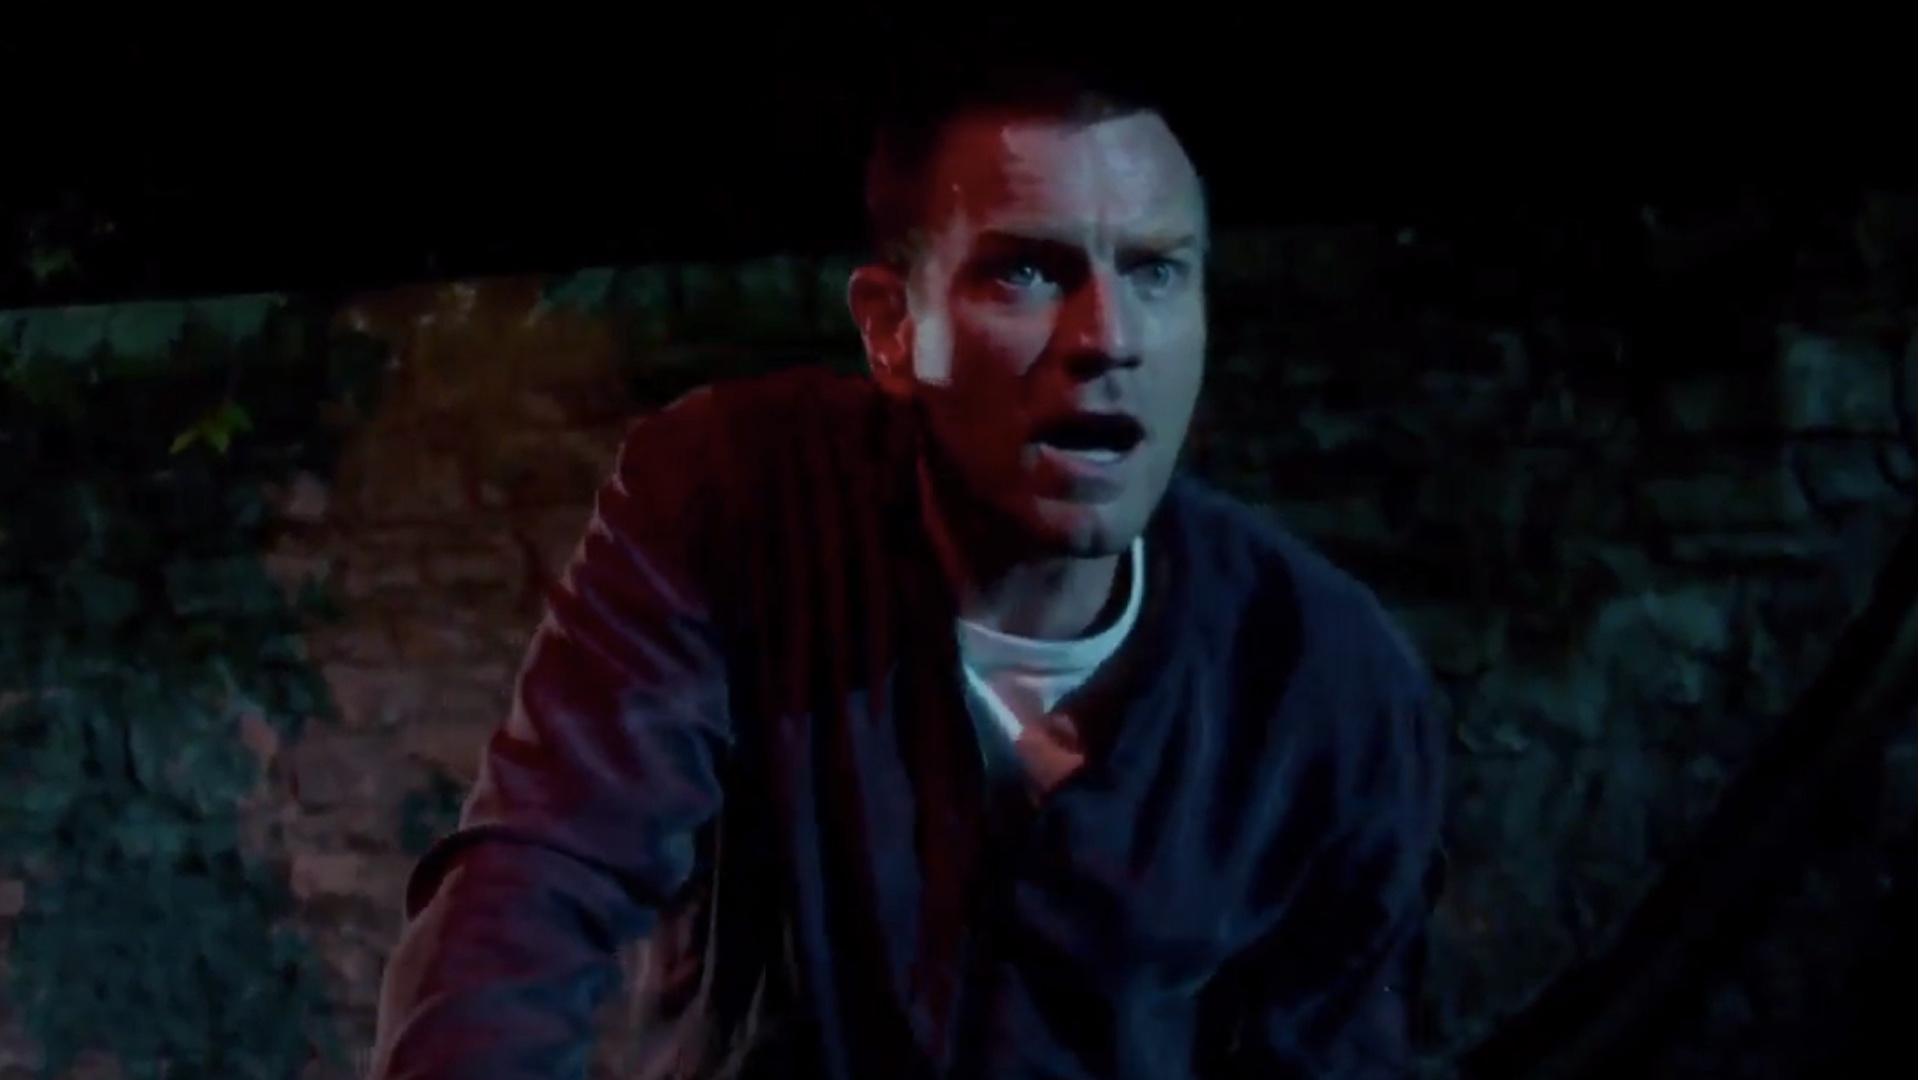 Ewan Mcgregor Will Play Danny Torrance In Stephen King S The Shining